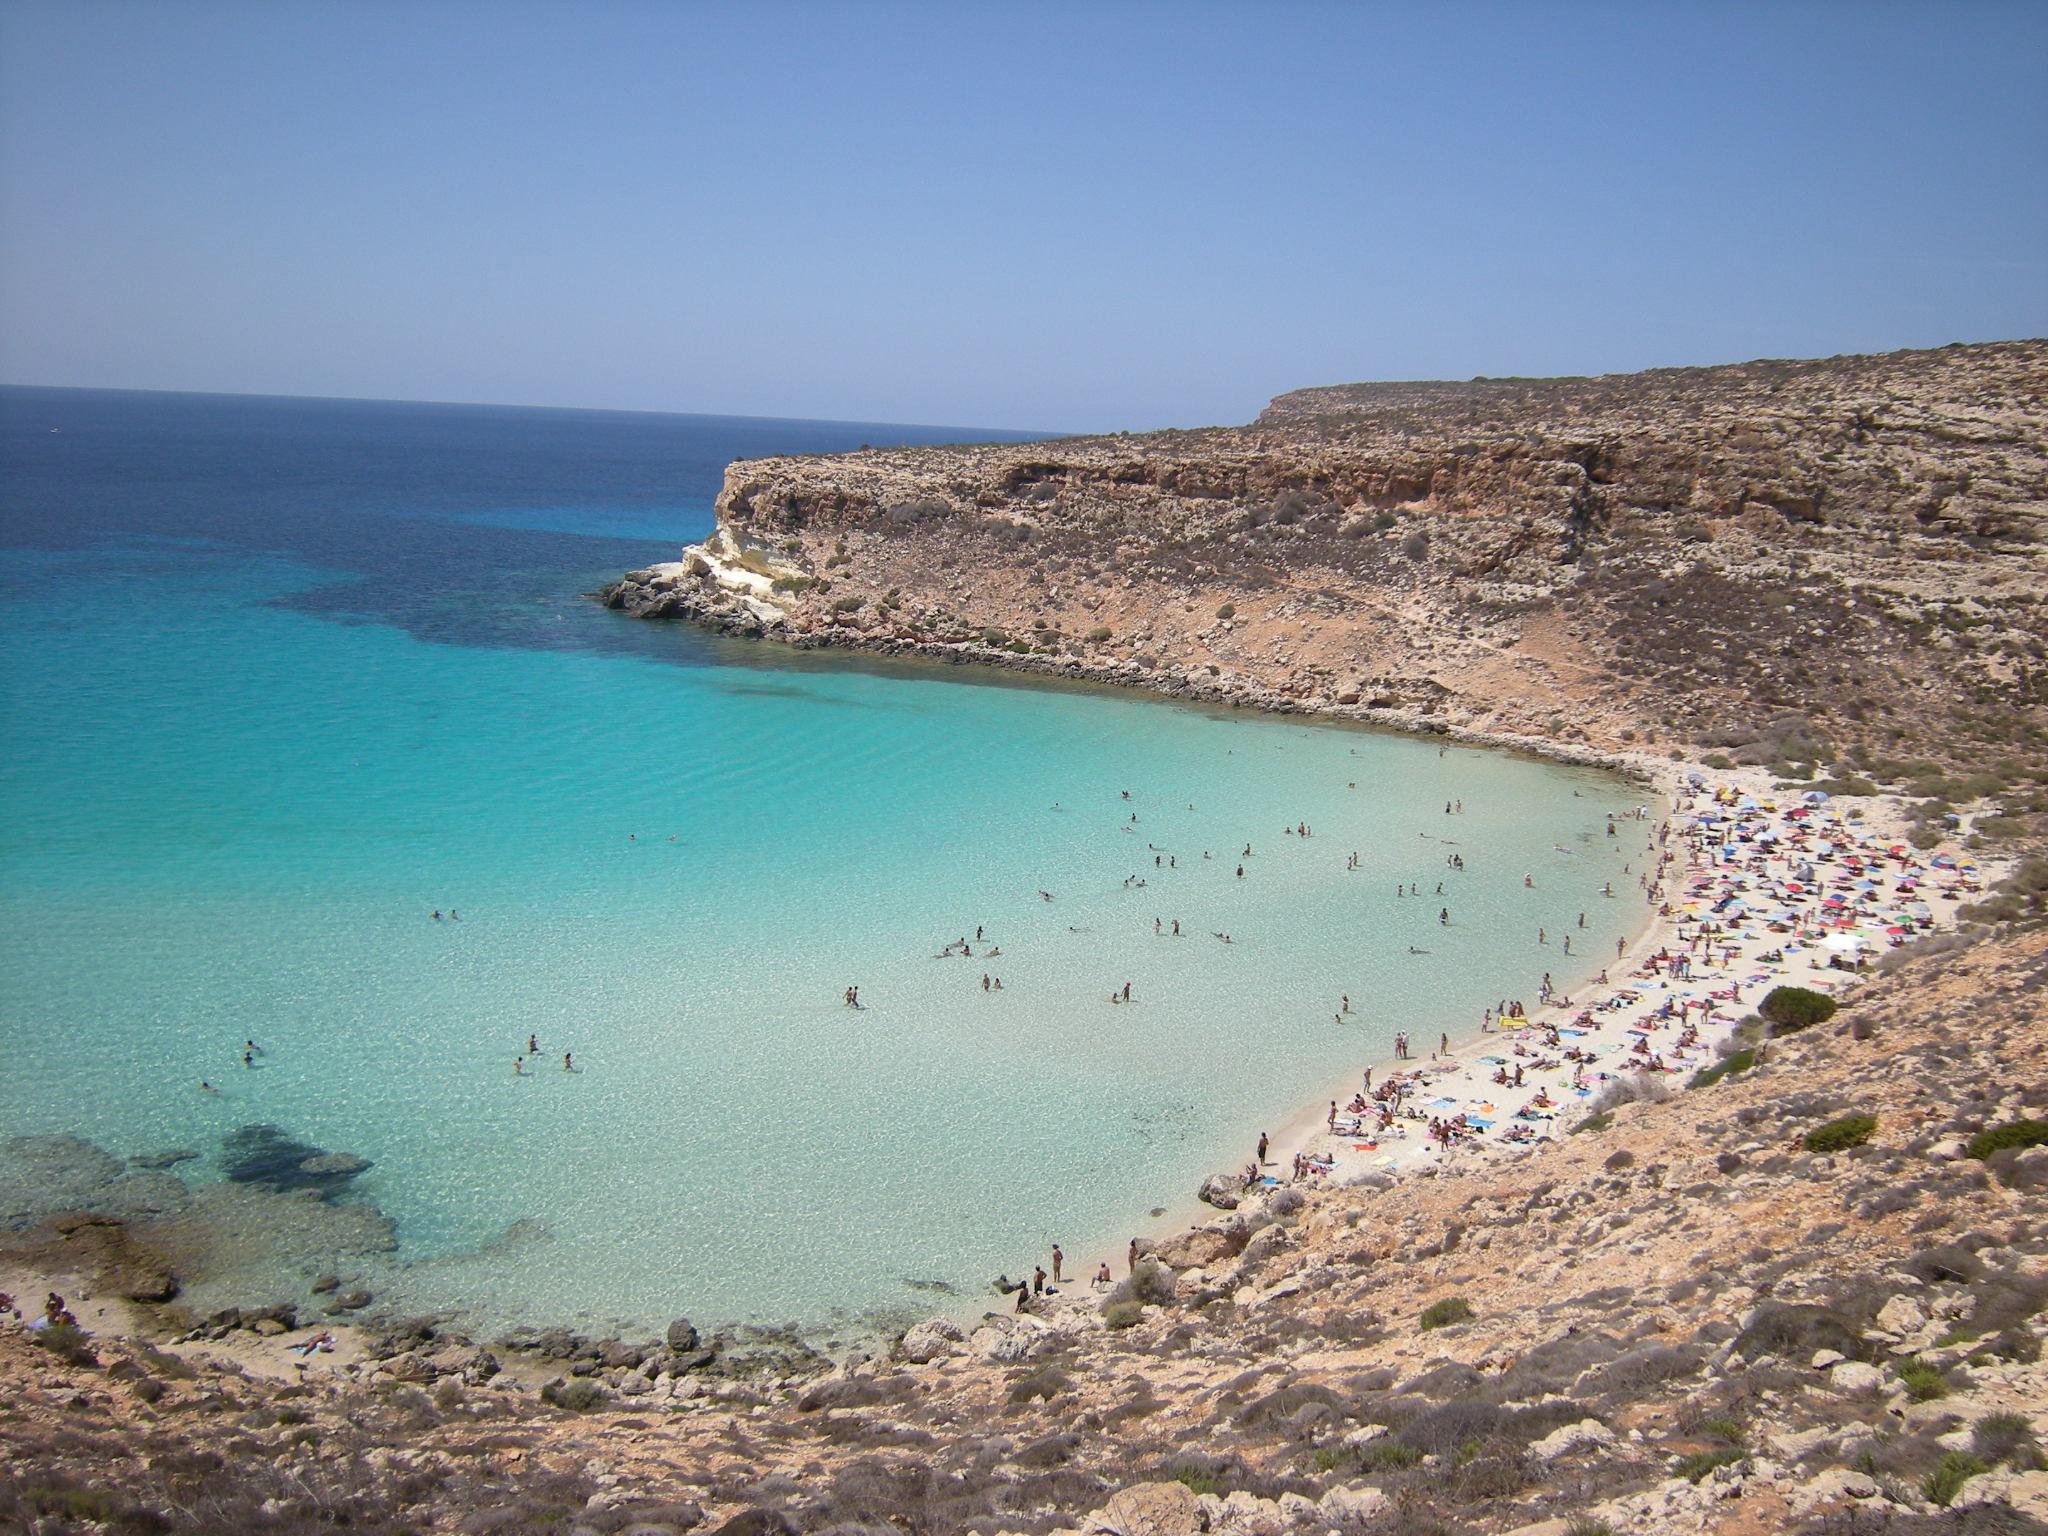 04_Rabbit-Beach_Lampedusa_Italy